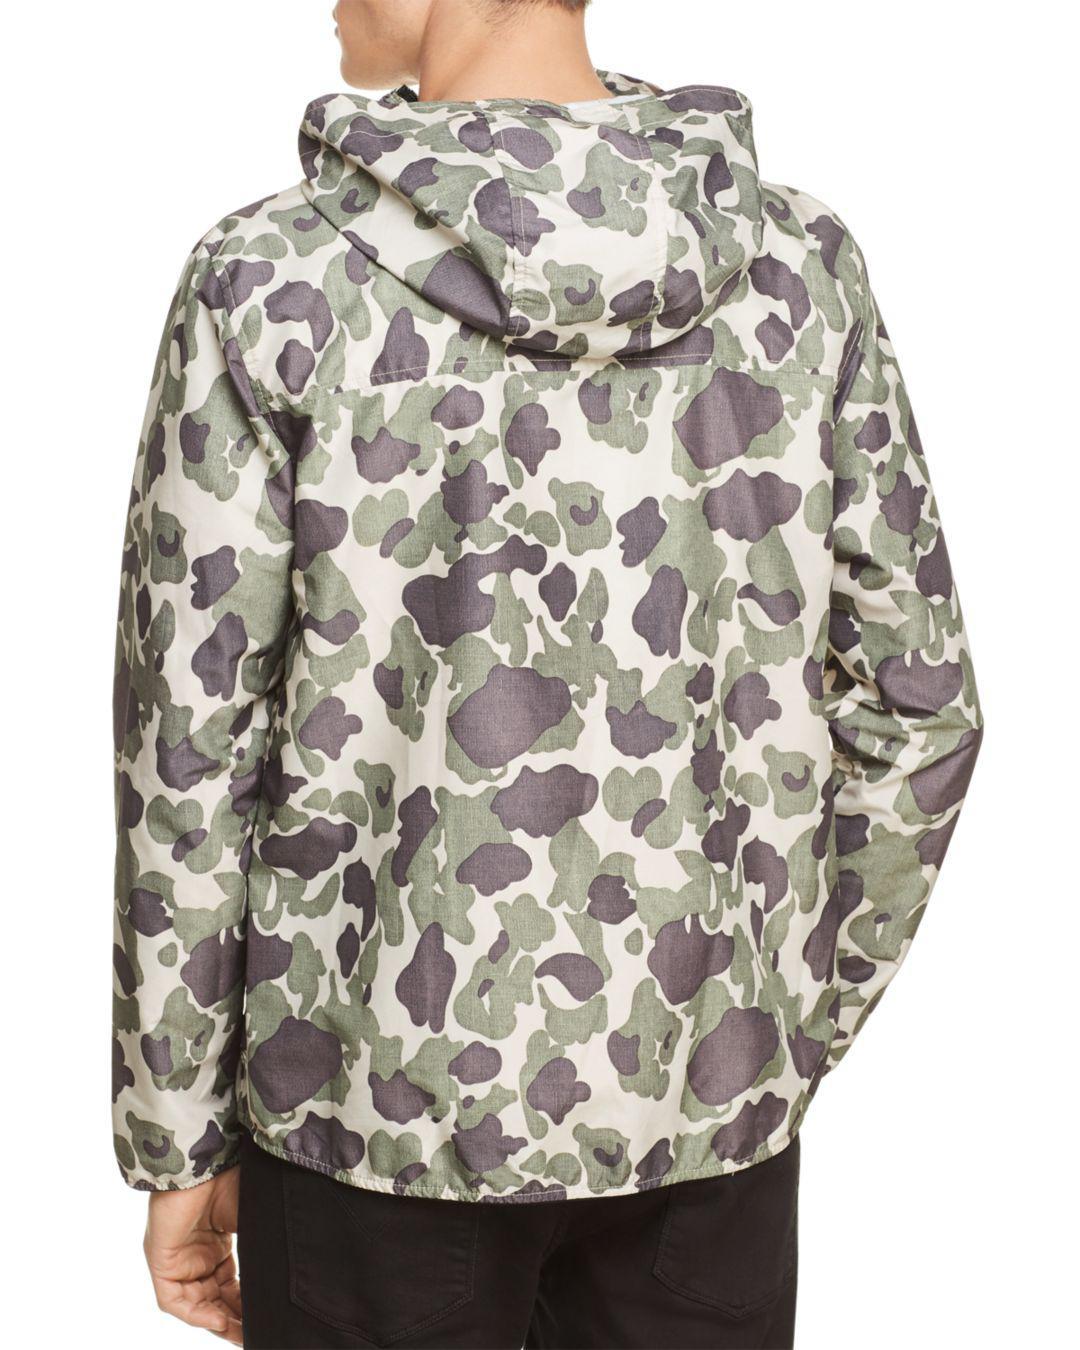 Herschel Supply Co. Voyage Camouflage Windbreaker Jacket for Men